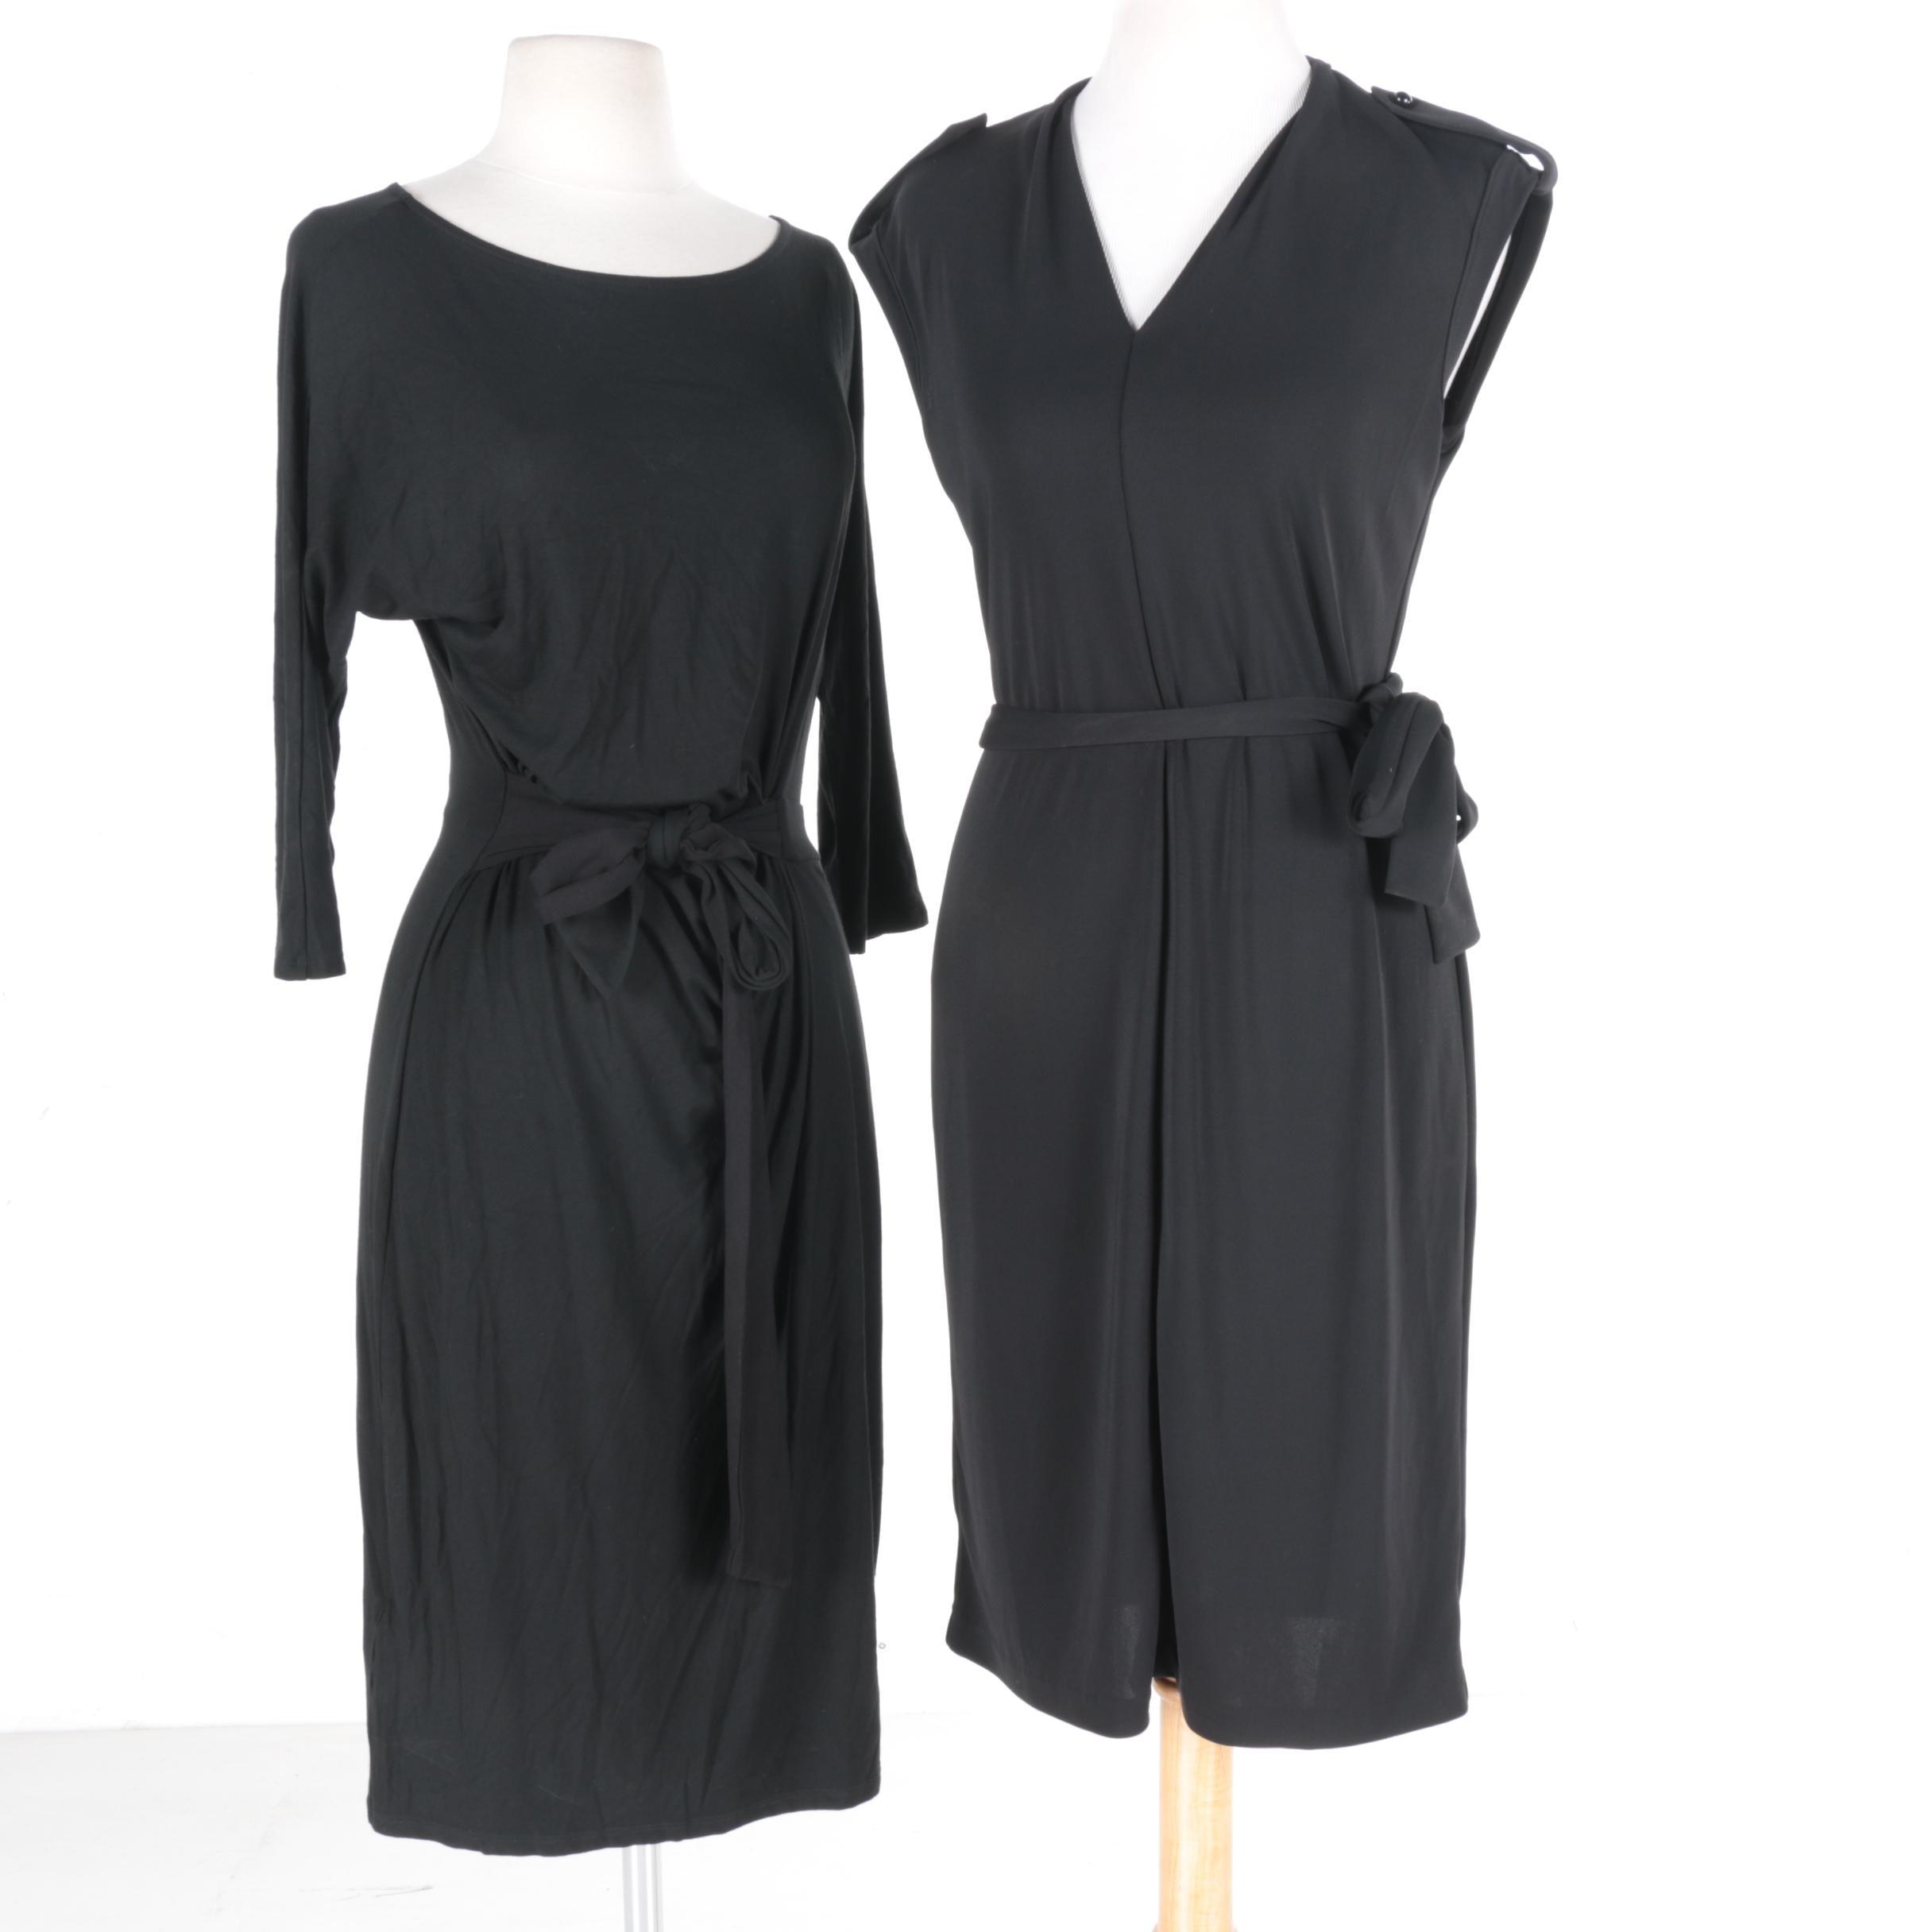 Talbots Dresses